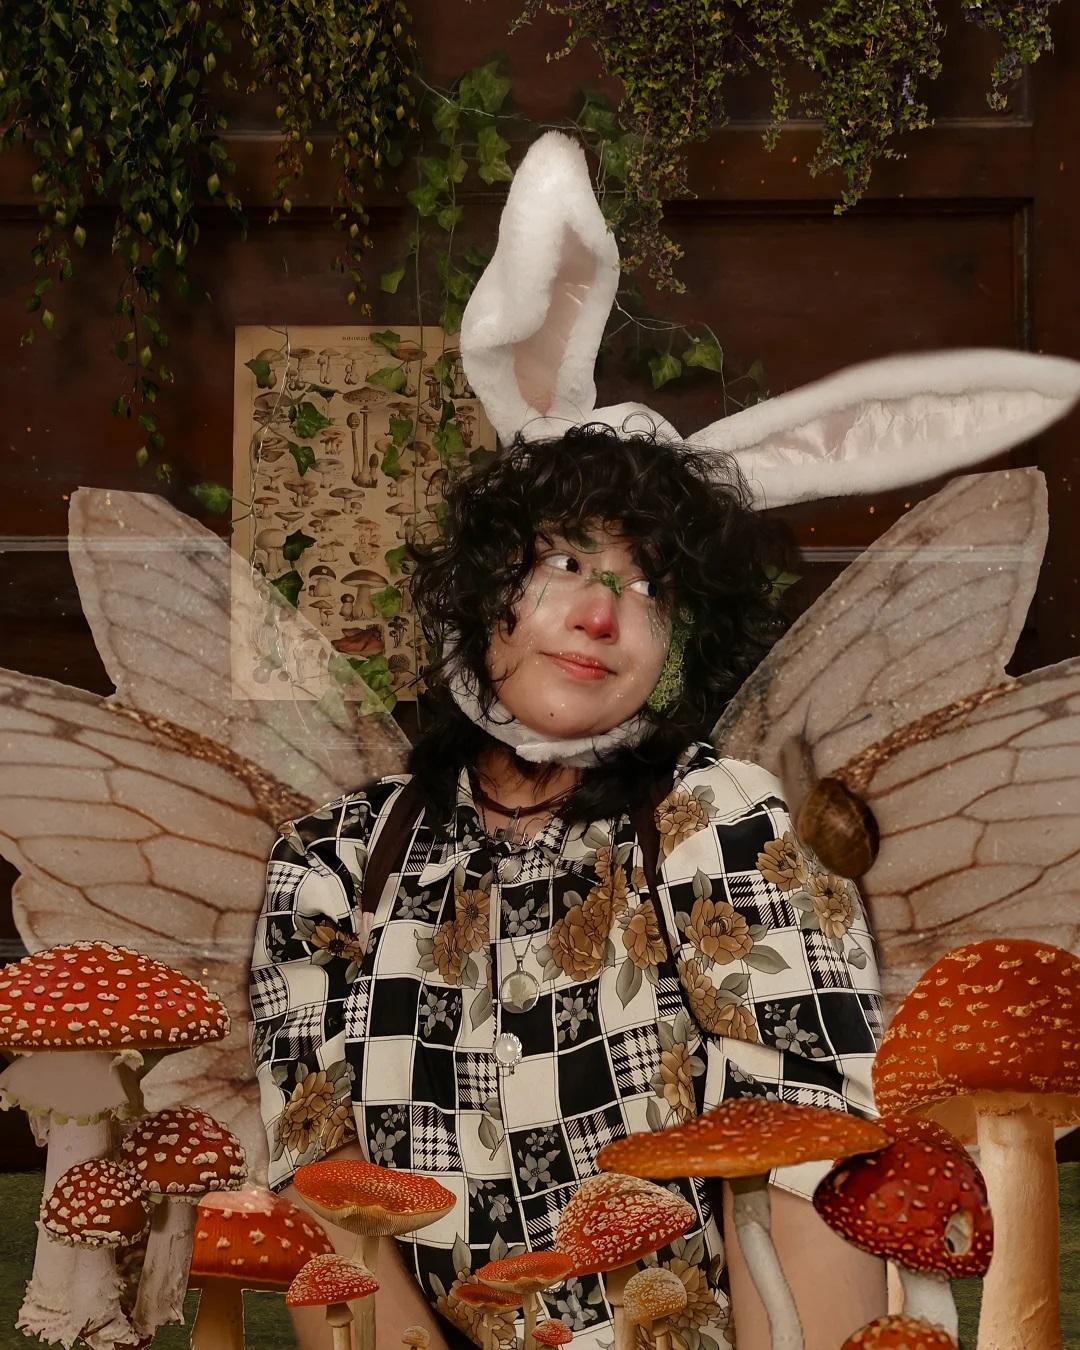 Fairy and mushroom goblincore aesthetic